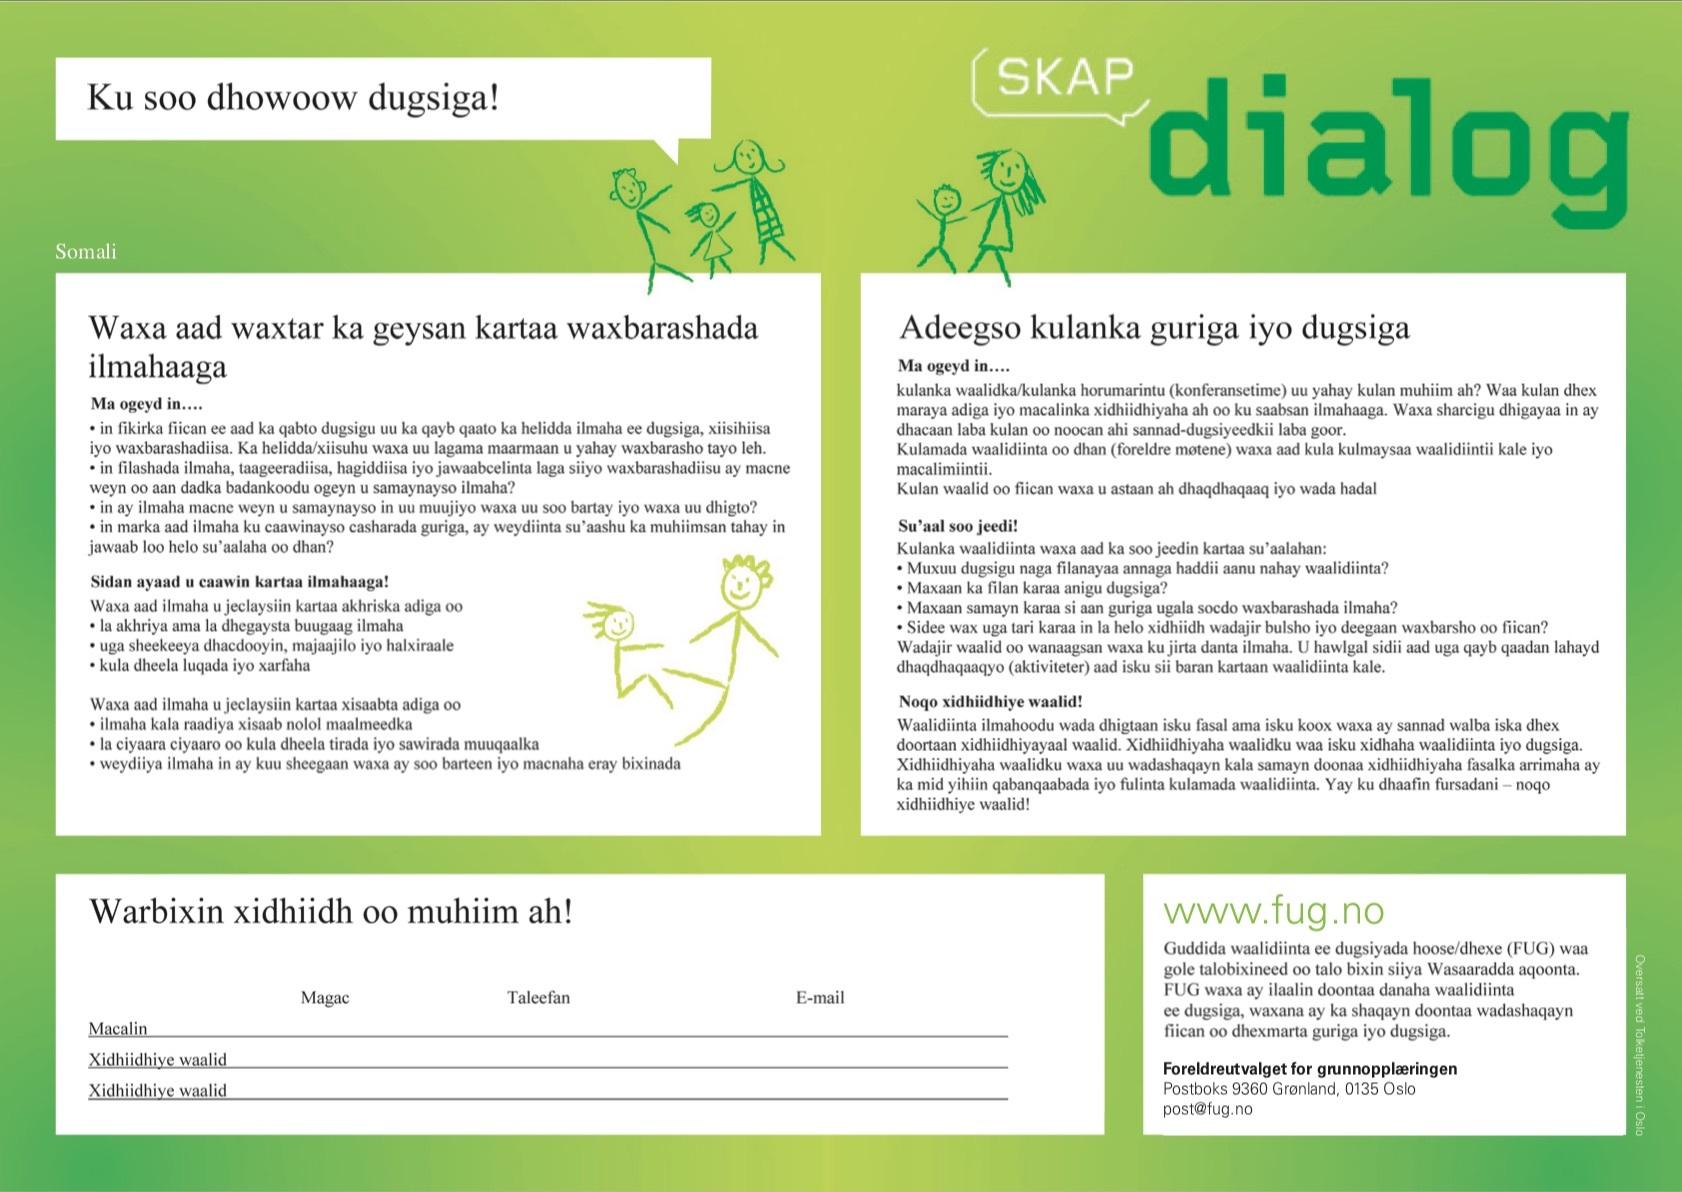 Skap dialog 1 somali